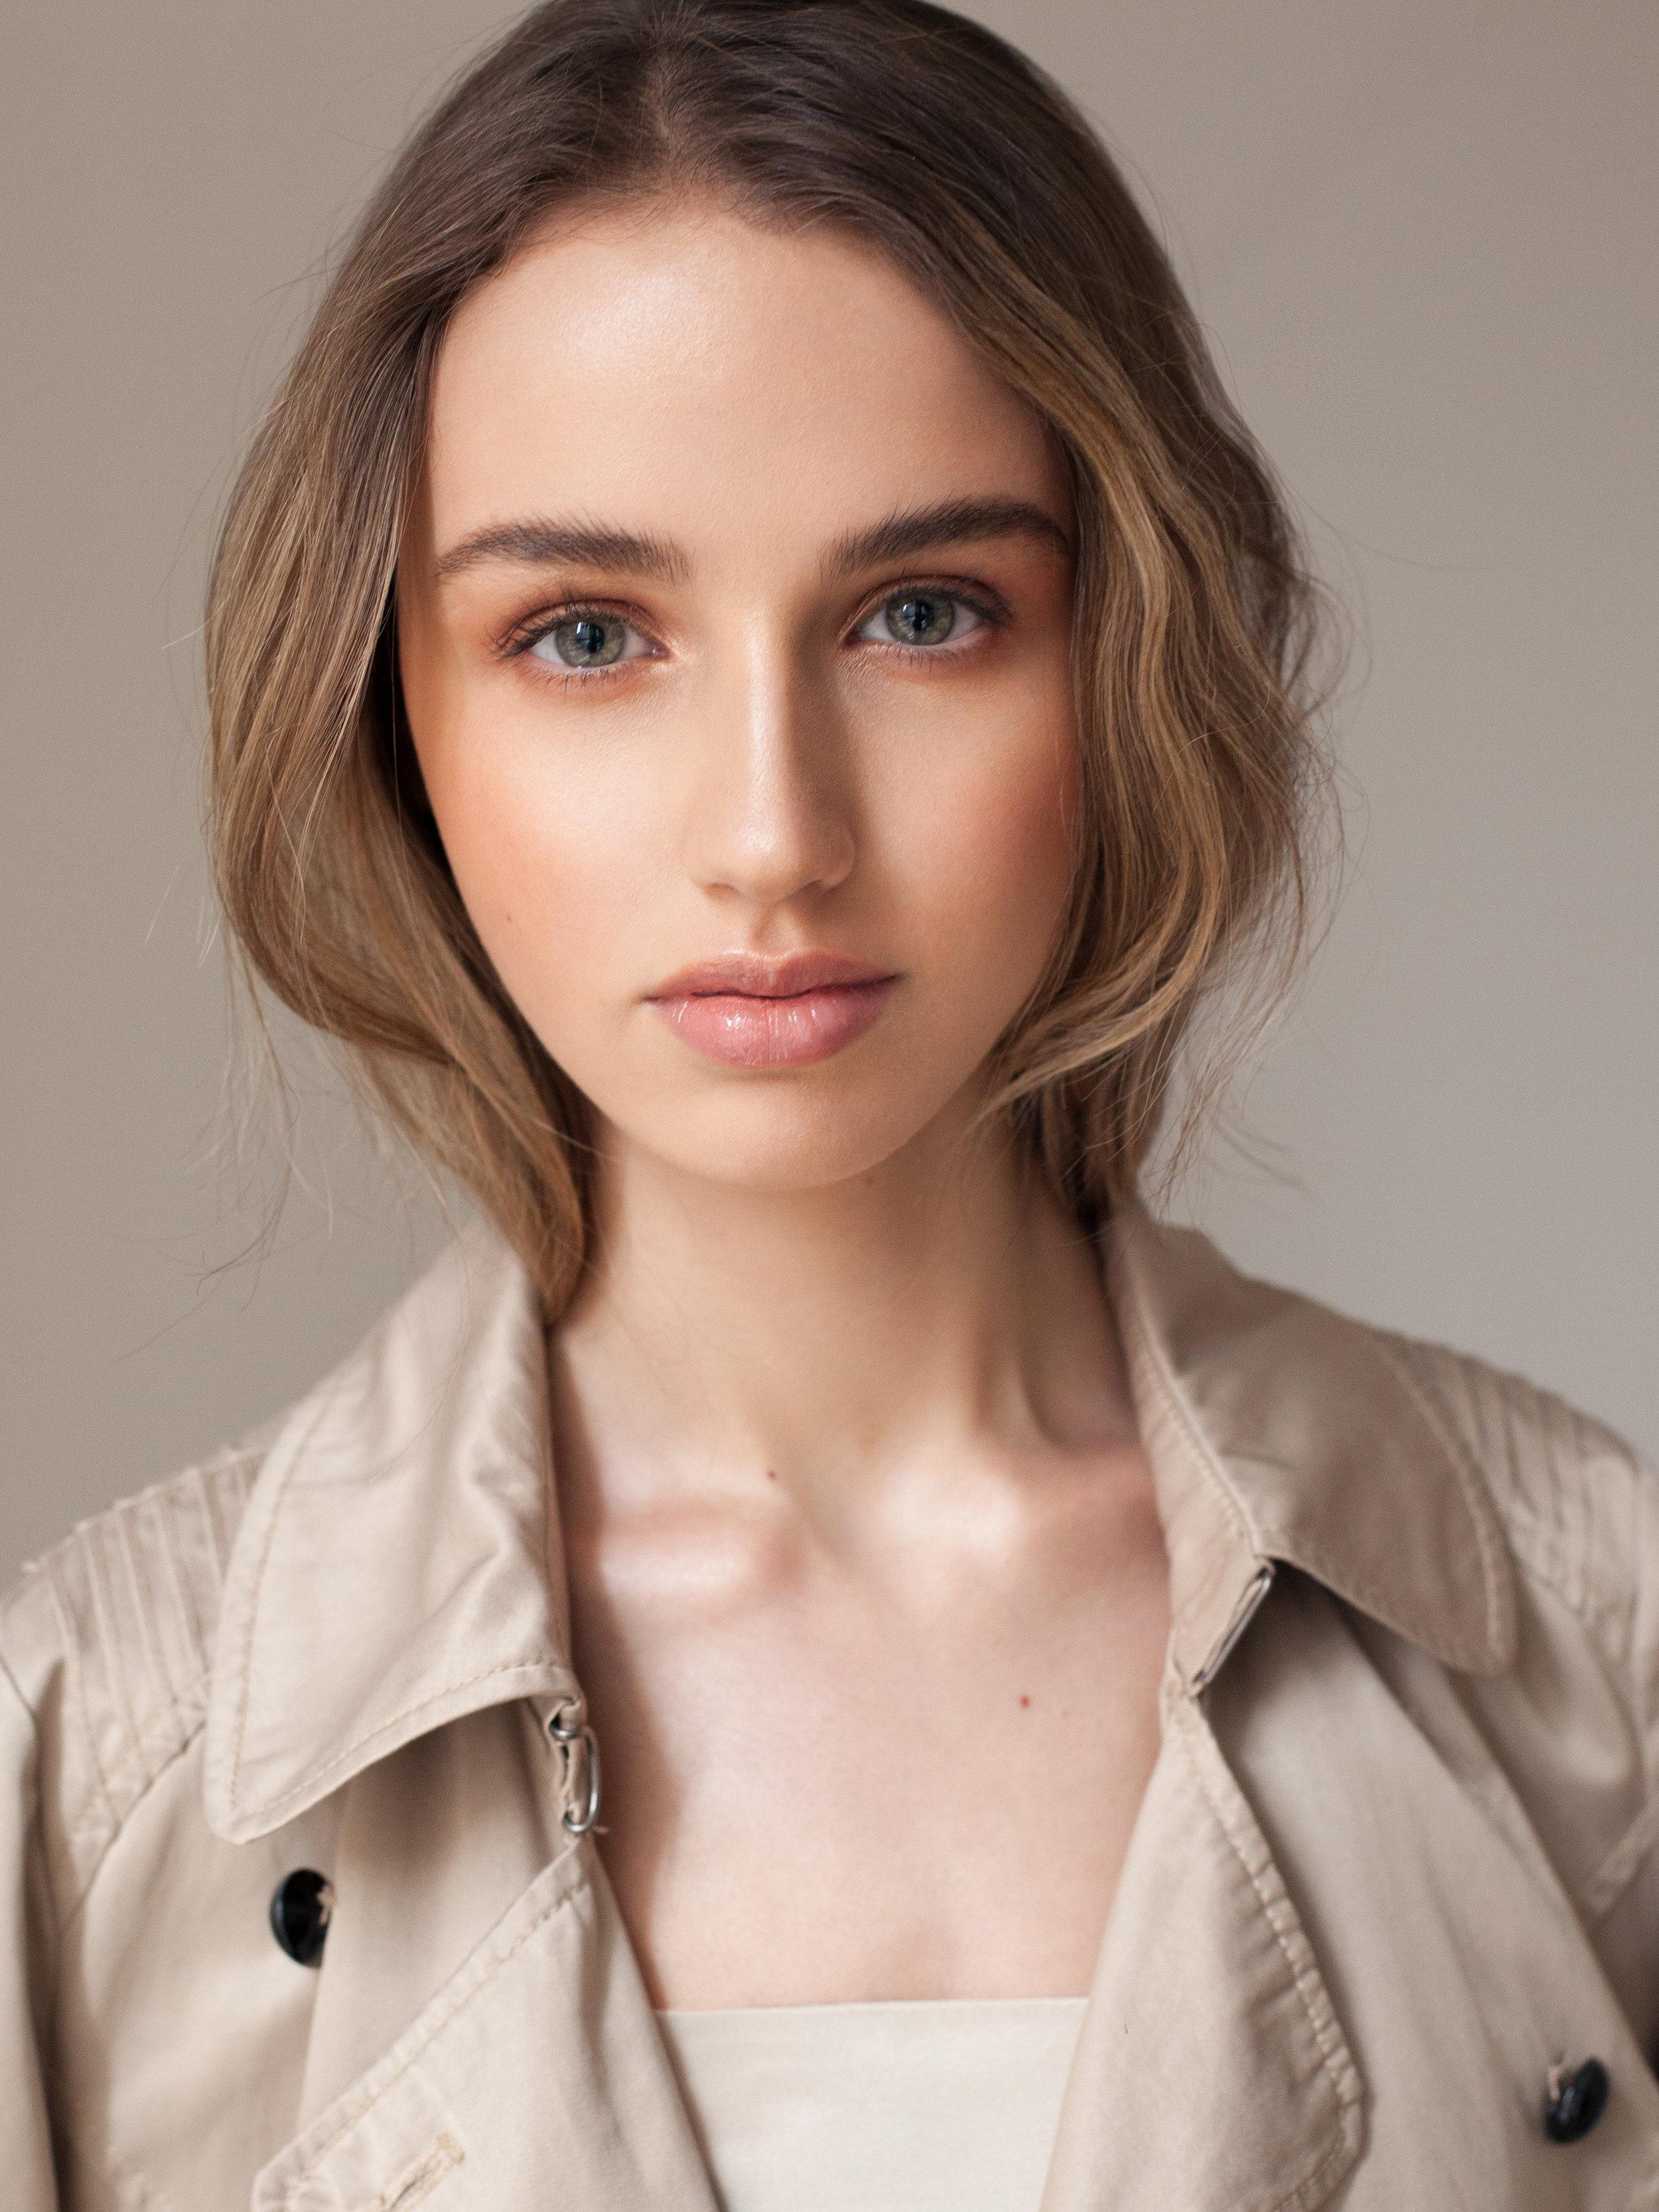 dayna  @ richards models